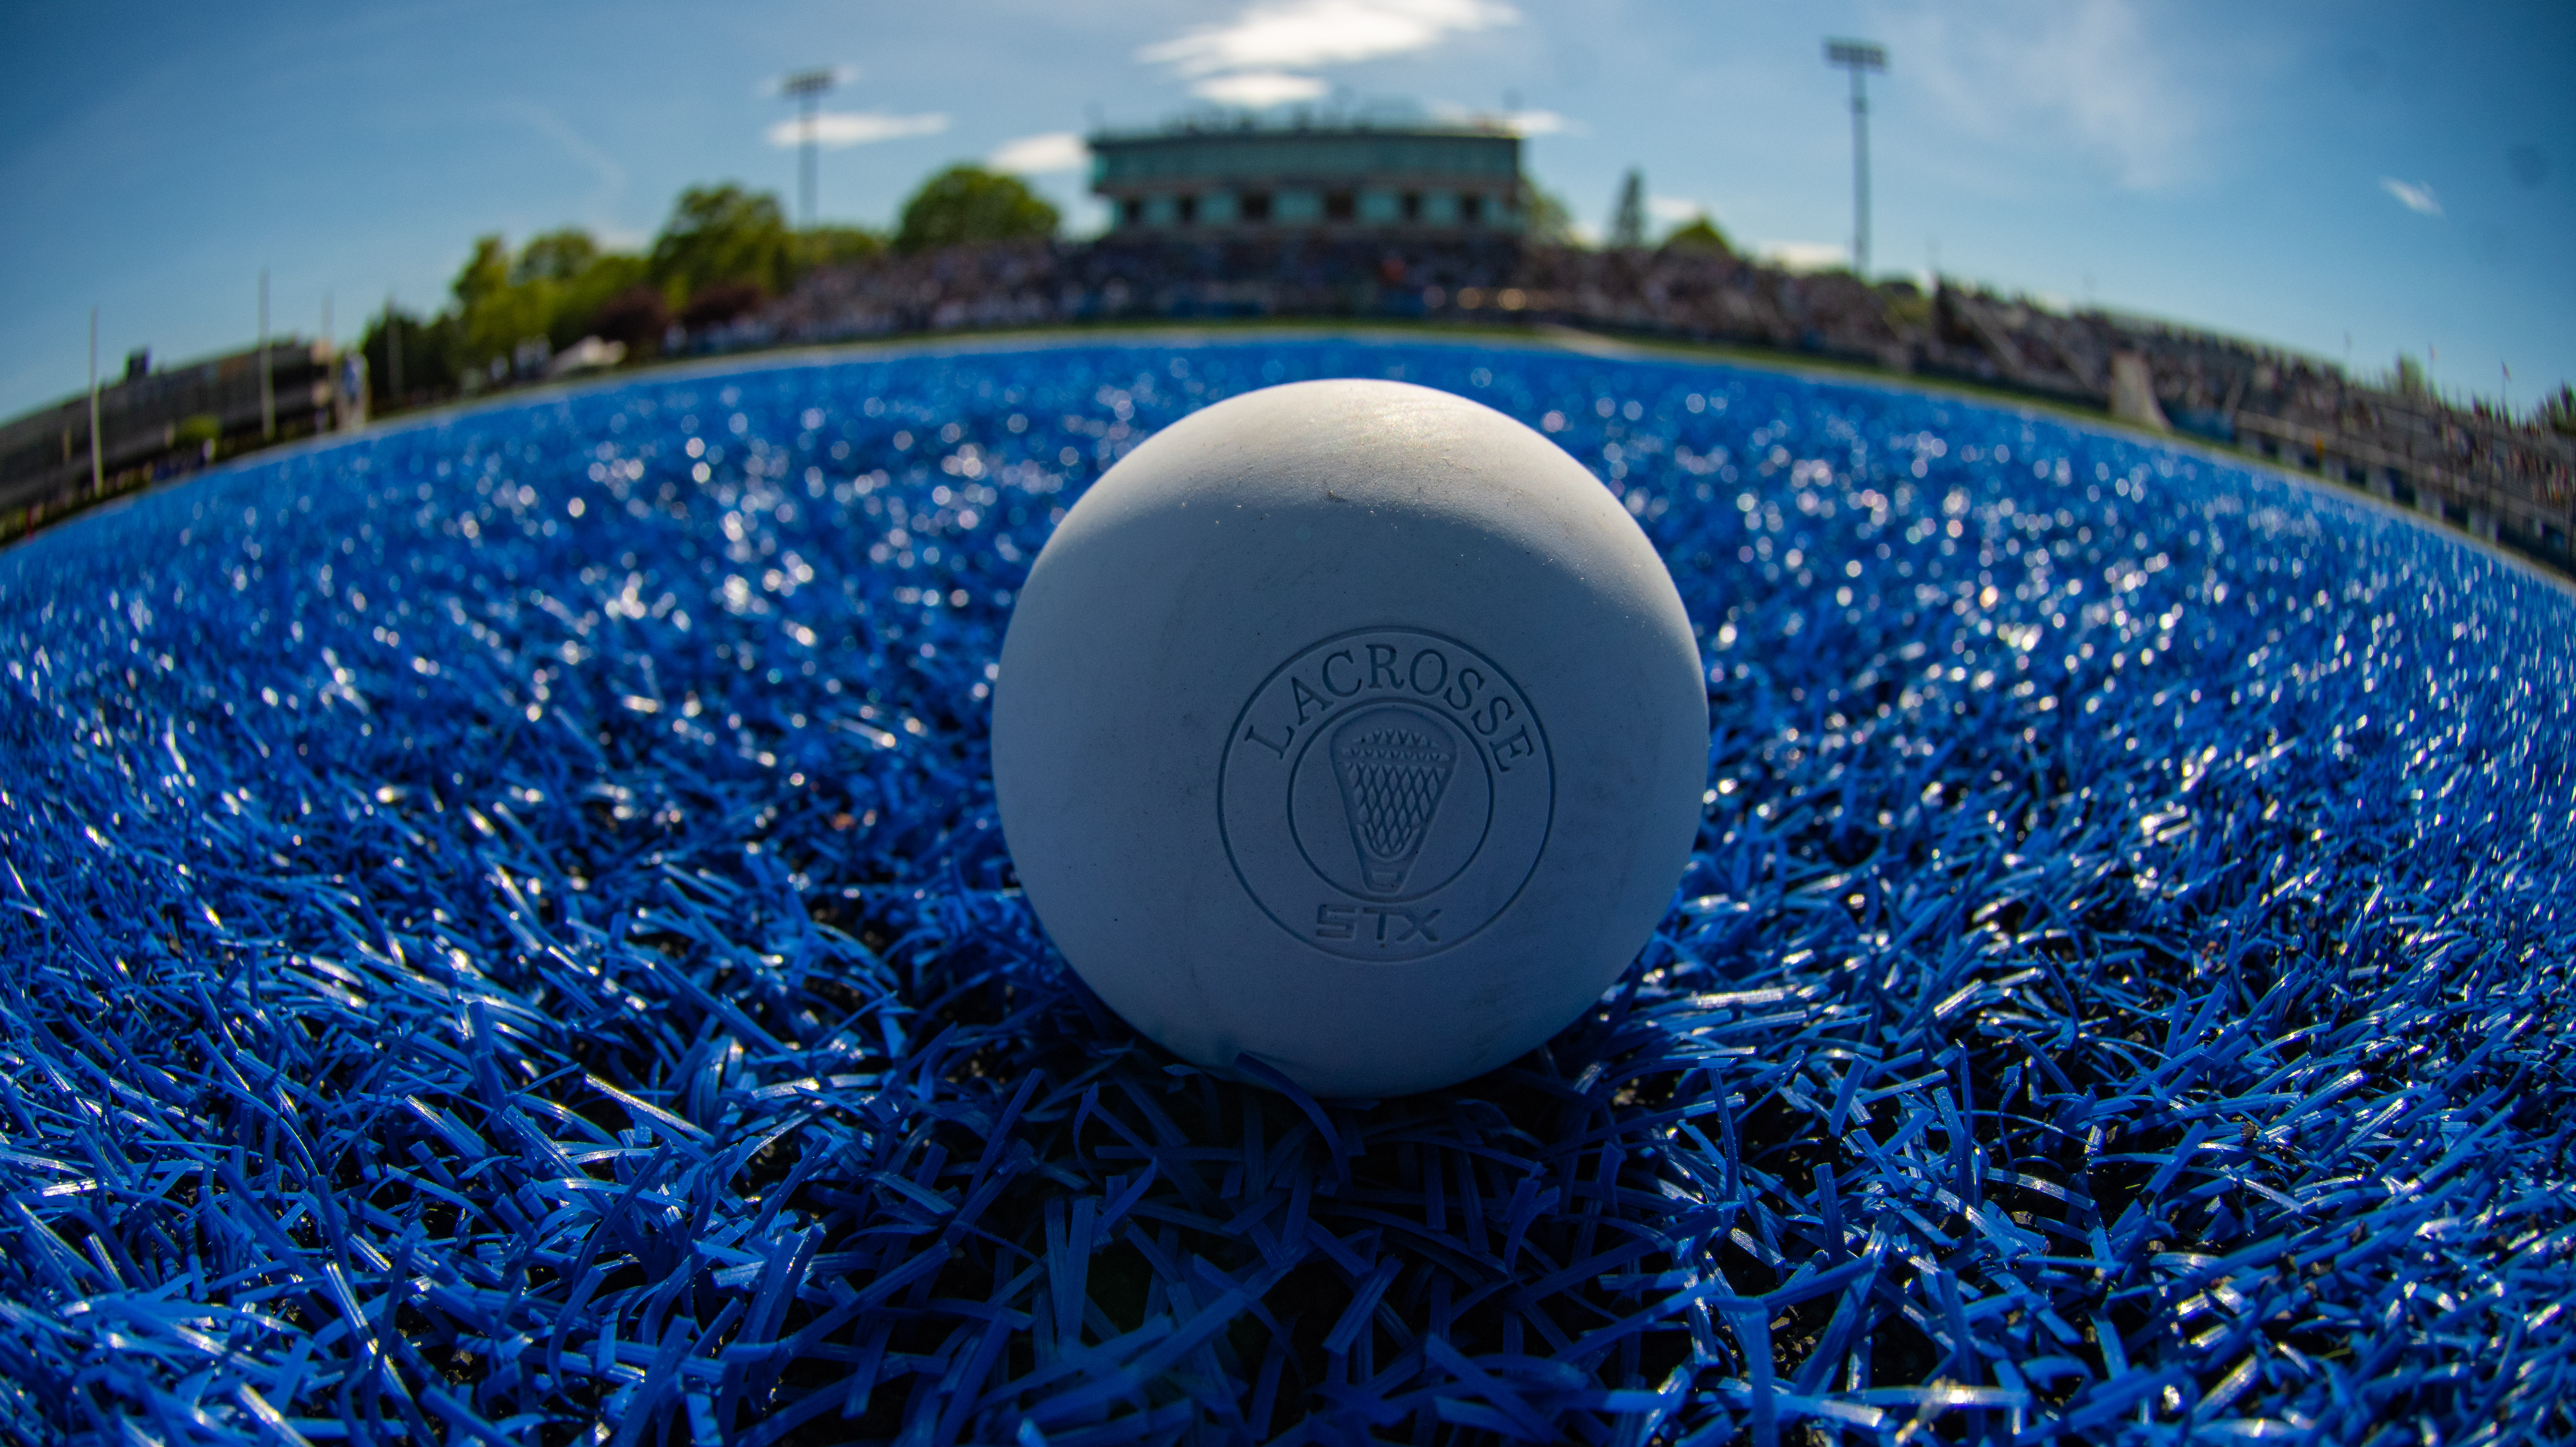 NCAA LACROSSE: MAY 18 NCAA Lacrosse Championships Quarterfinals